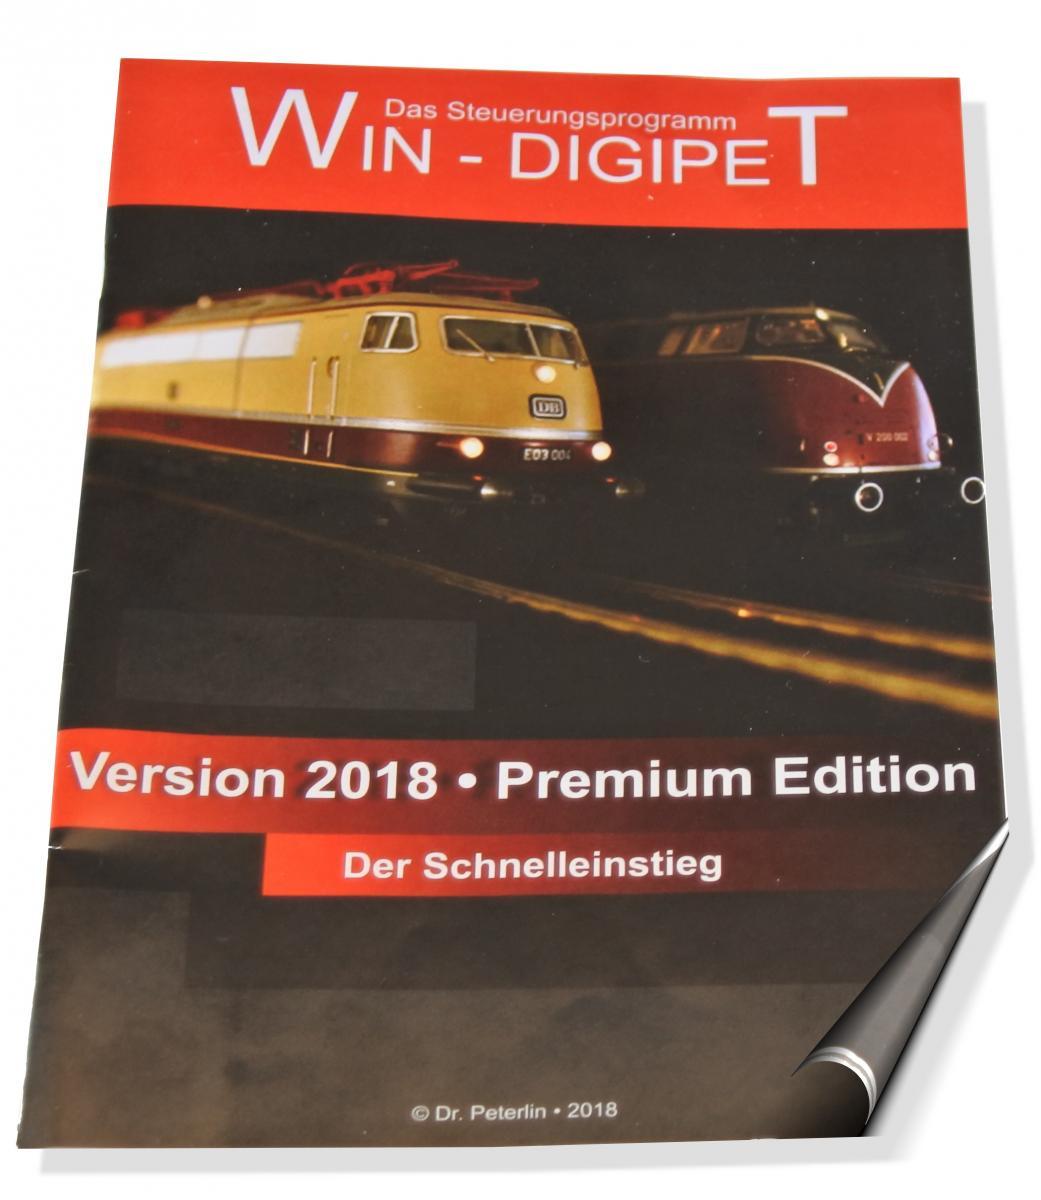 Windigipet 2018 premium